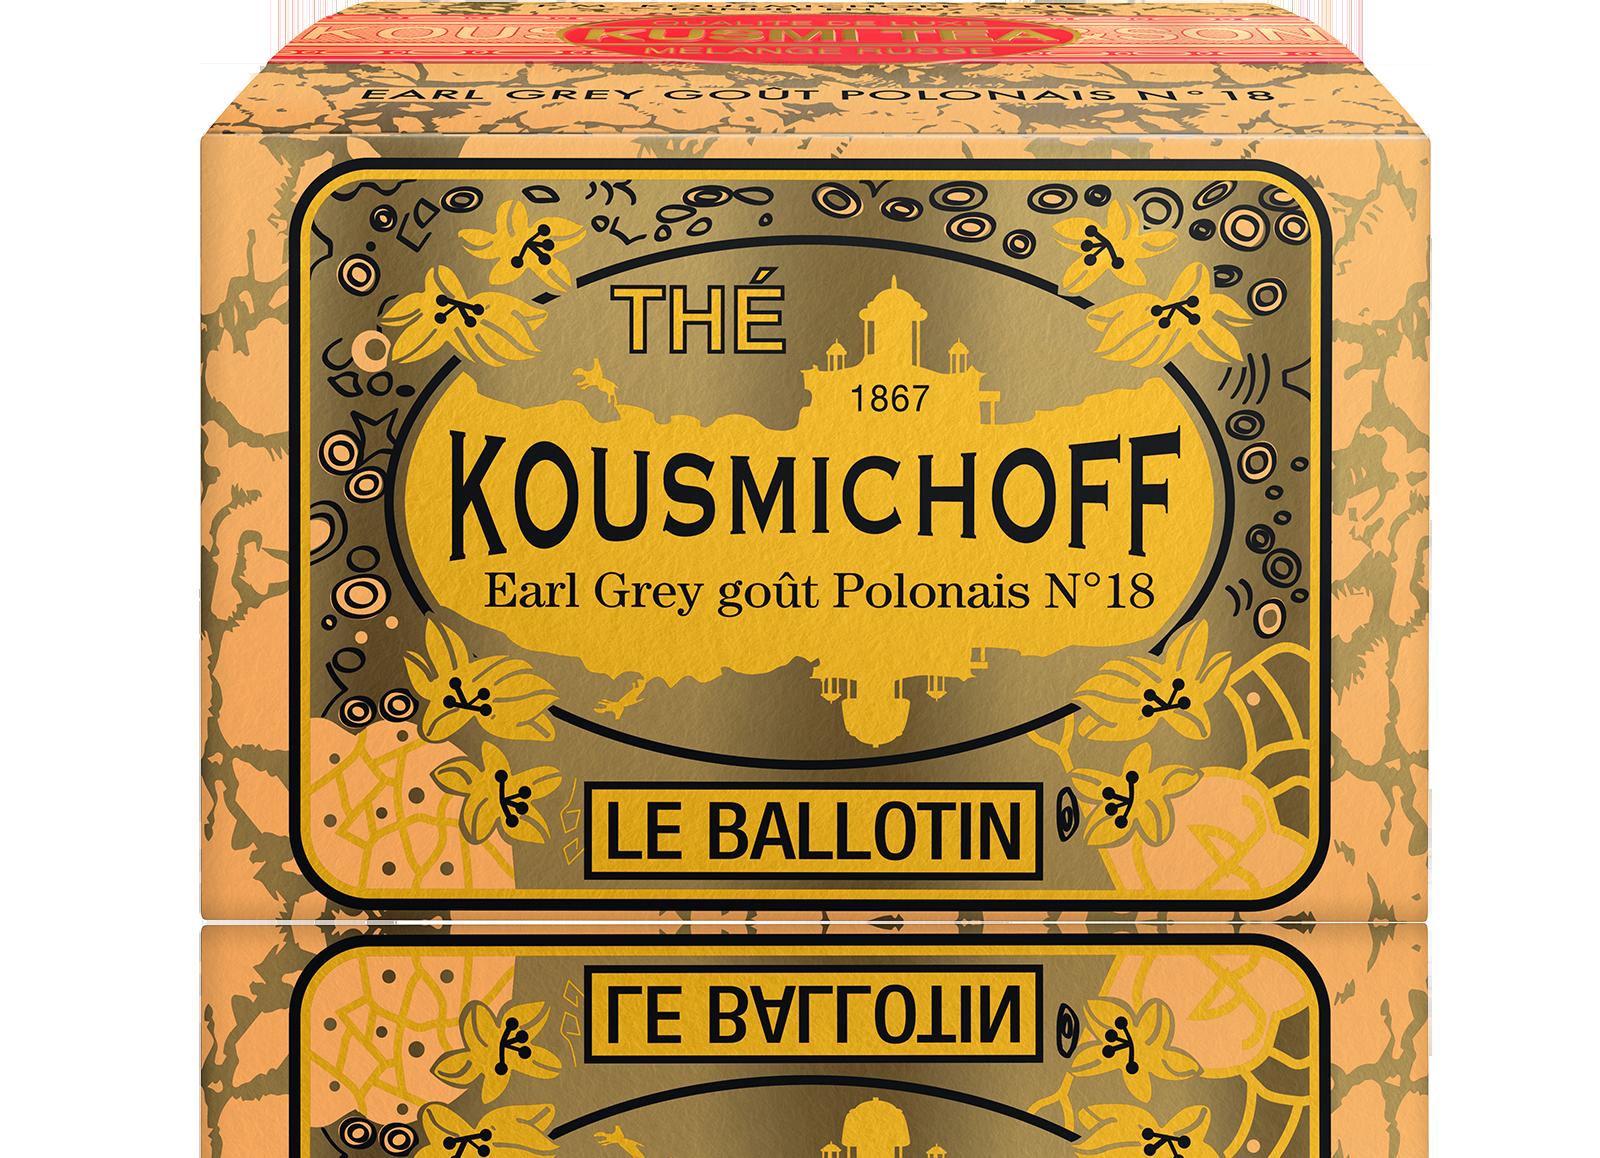 Earl Grey - Earl Grey goût Polonais N°18 - Vrac - Kusmi Tea